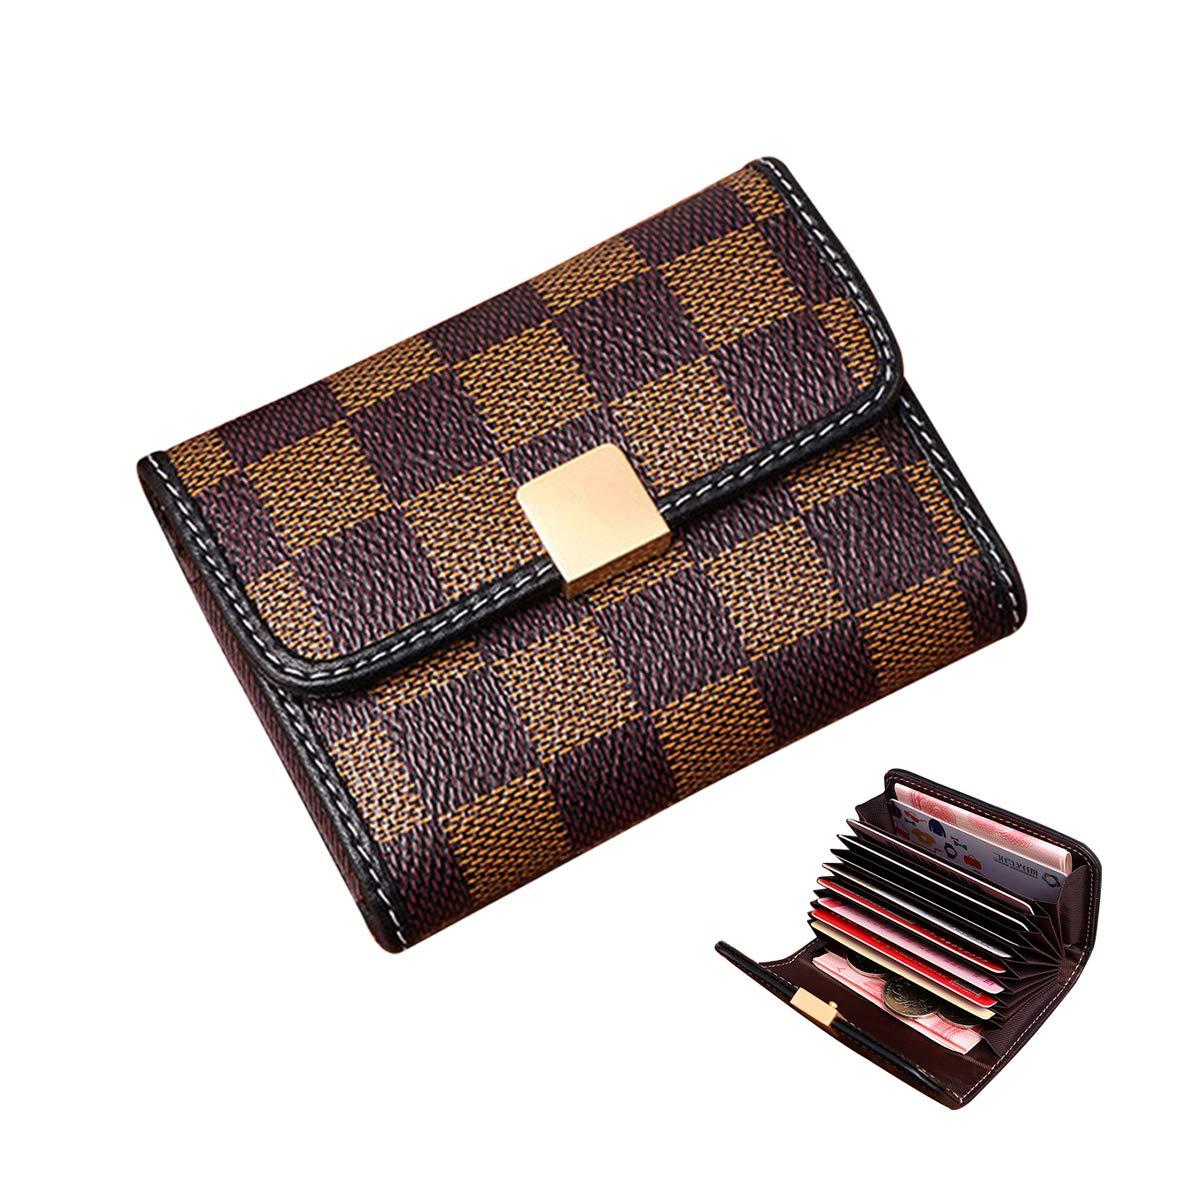 Women Designer Wallet Rfid Blocking Credit Card Holder Wallets Pu Leather Small Accordion Ladies Purse - Brown